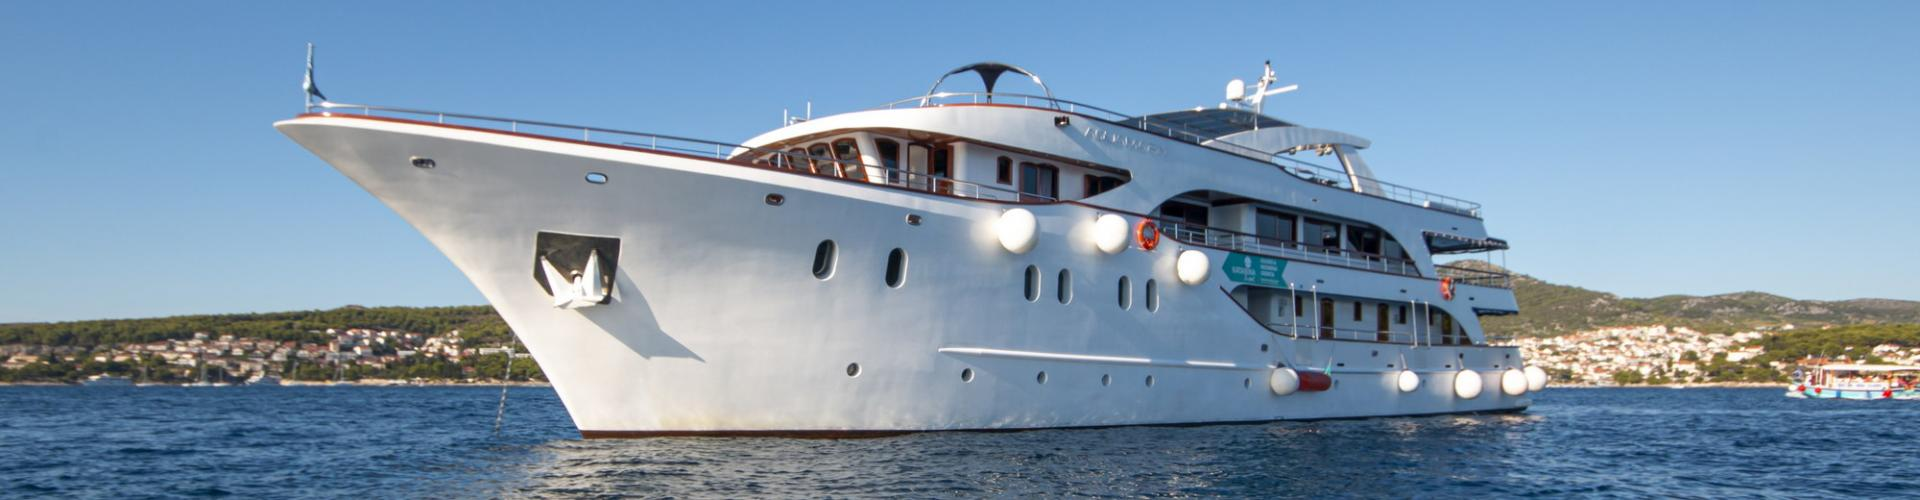 barca a motore Deluxe nave da crociera MV Aquamarin